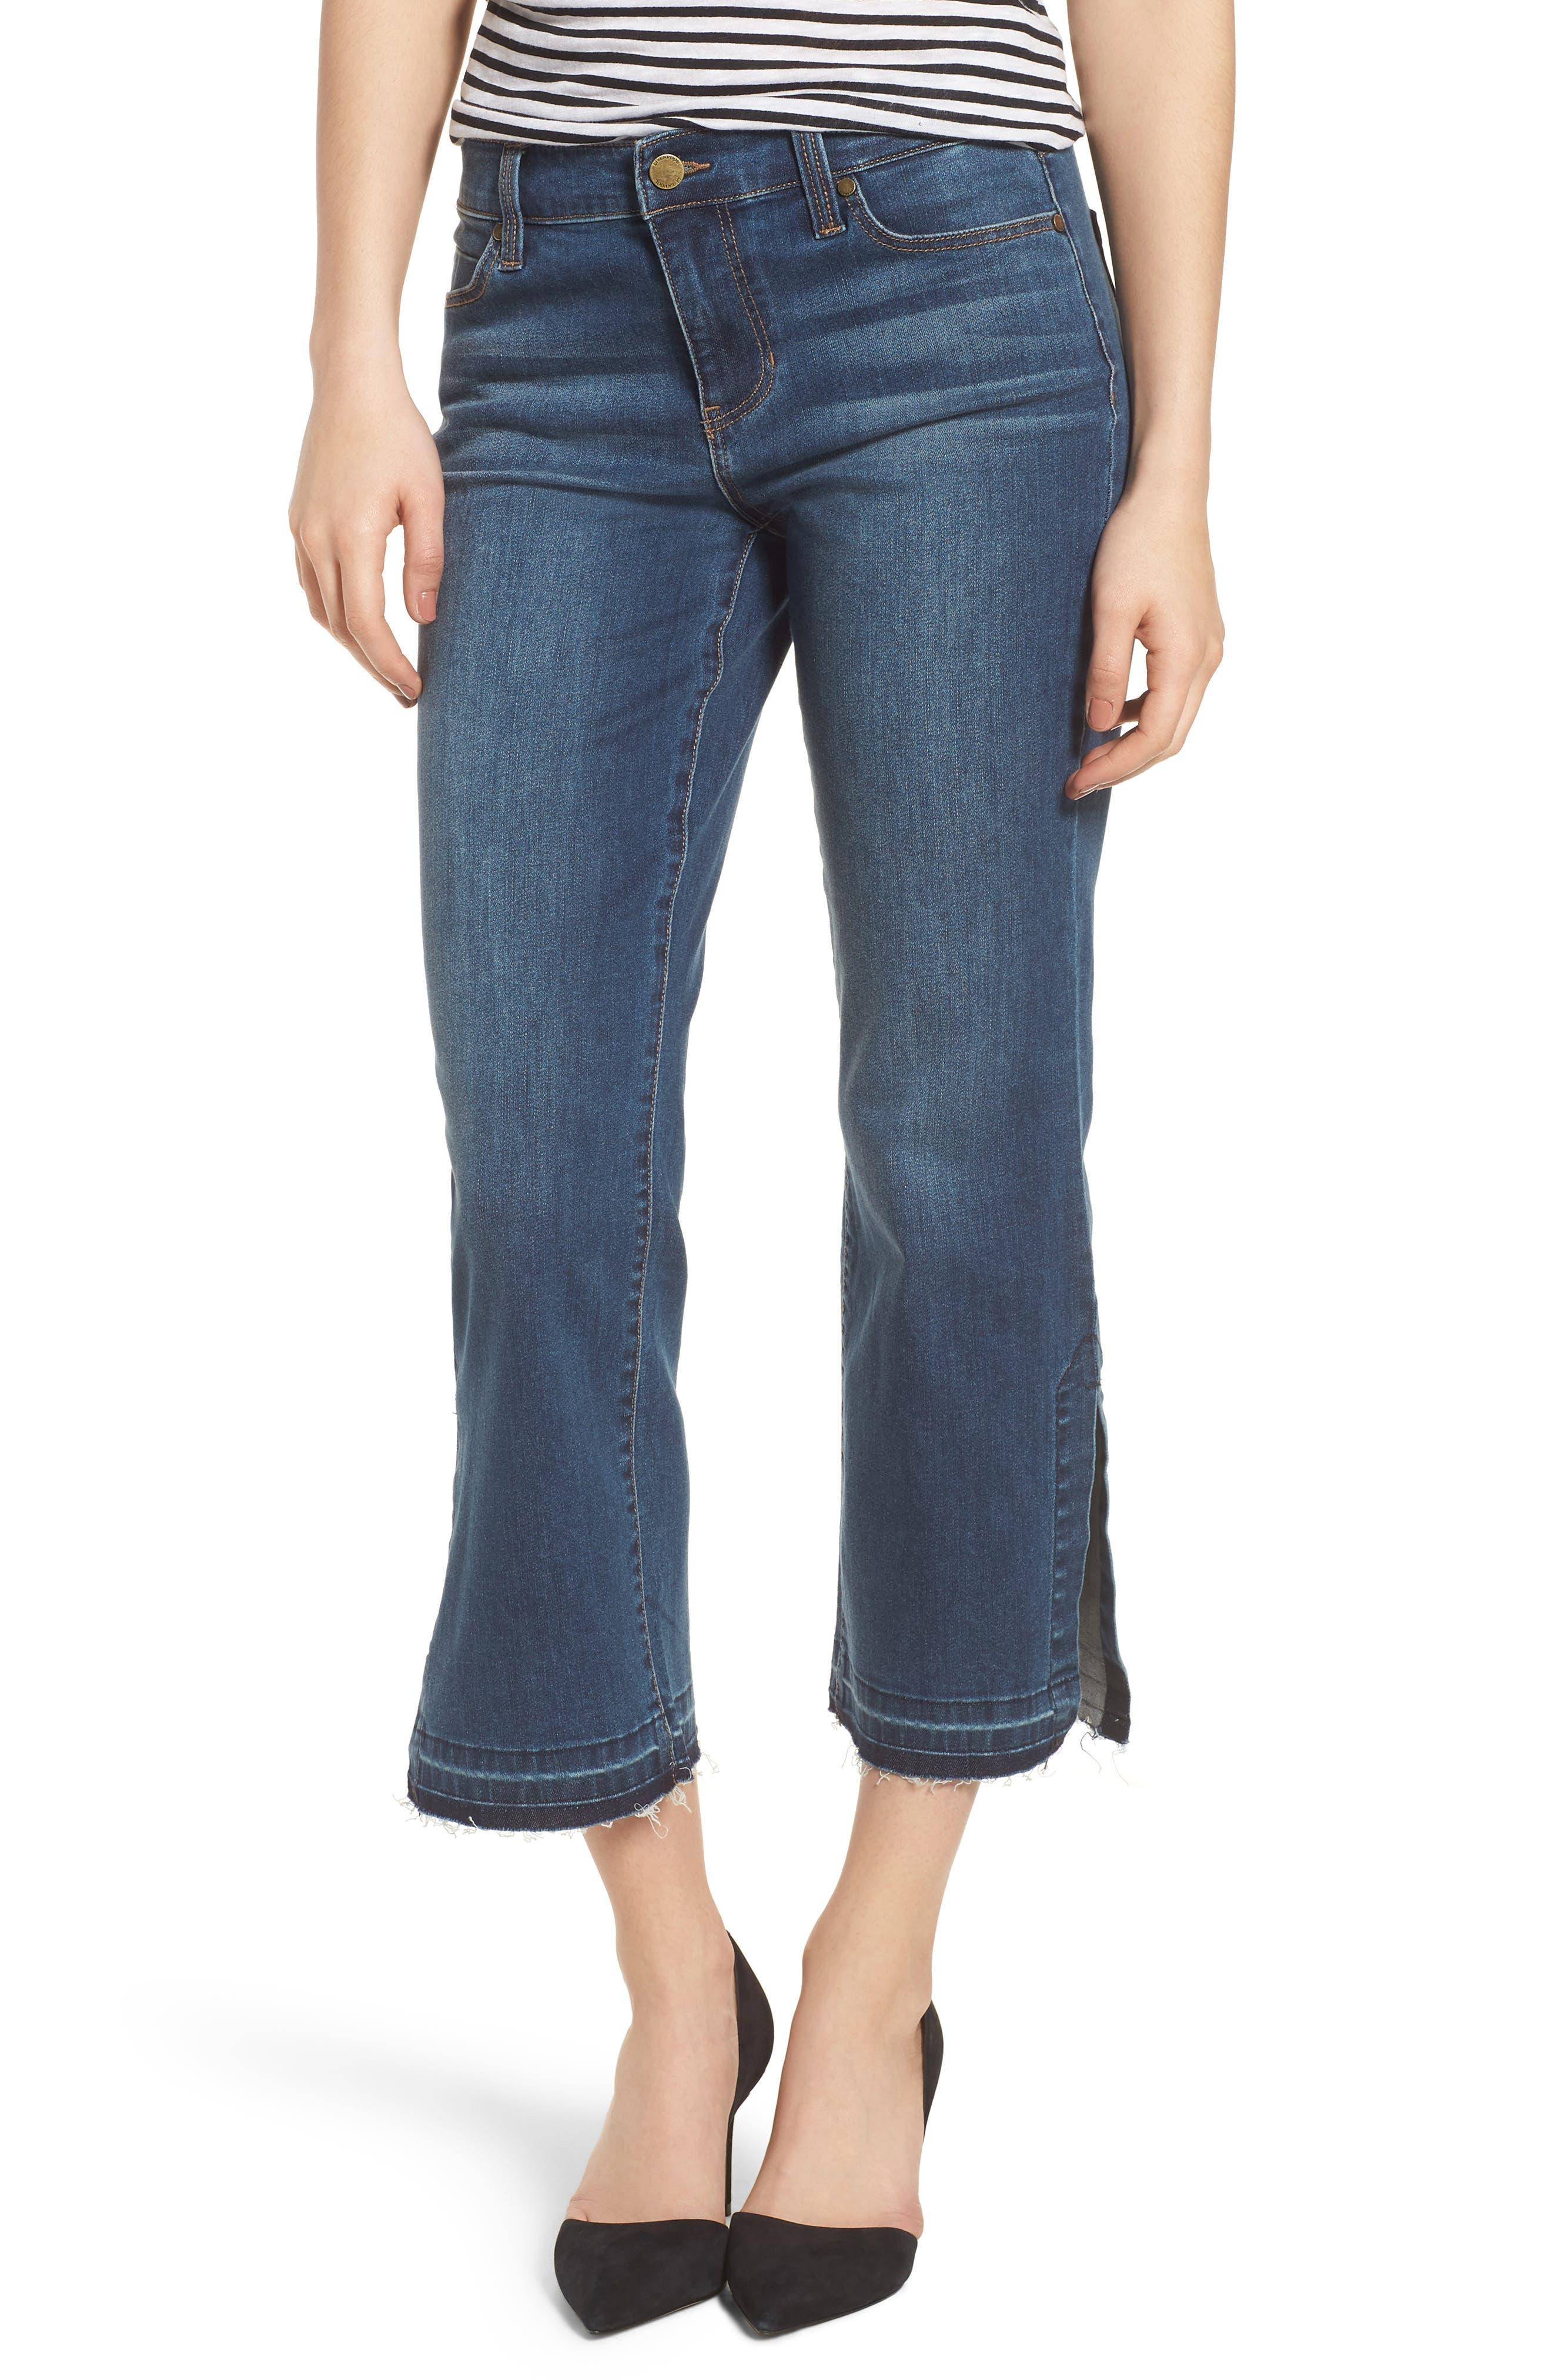 Tabitha Release Hem Crop Jeans,                             Main thumbnail 1, color,                             Montauk Mid Blue